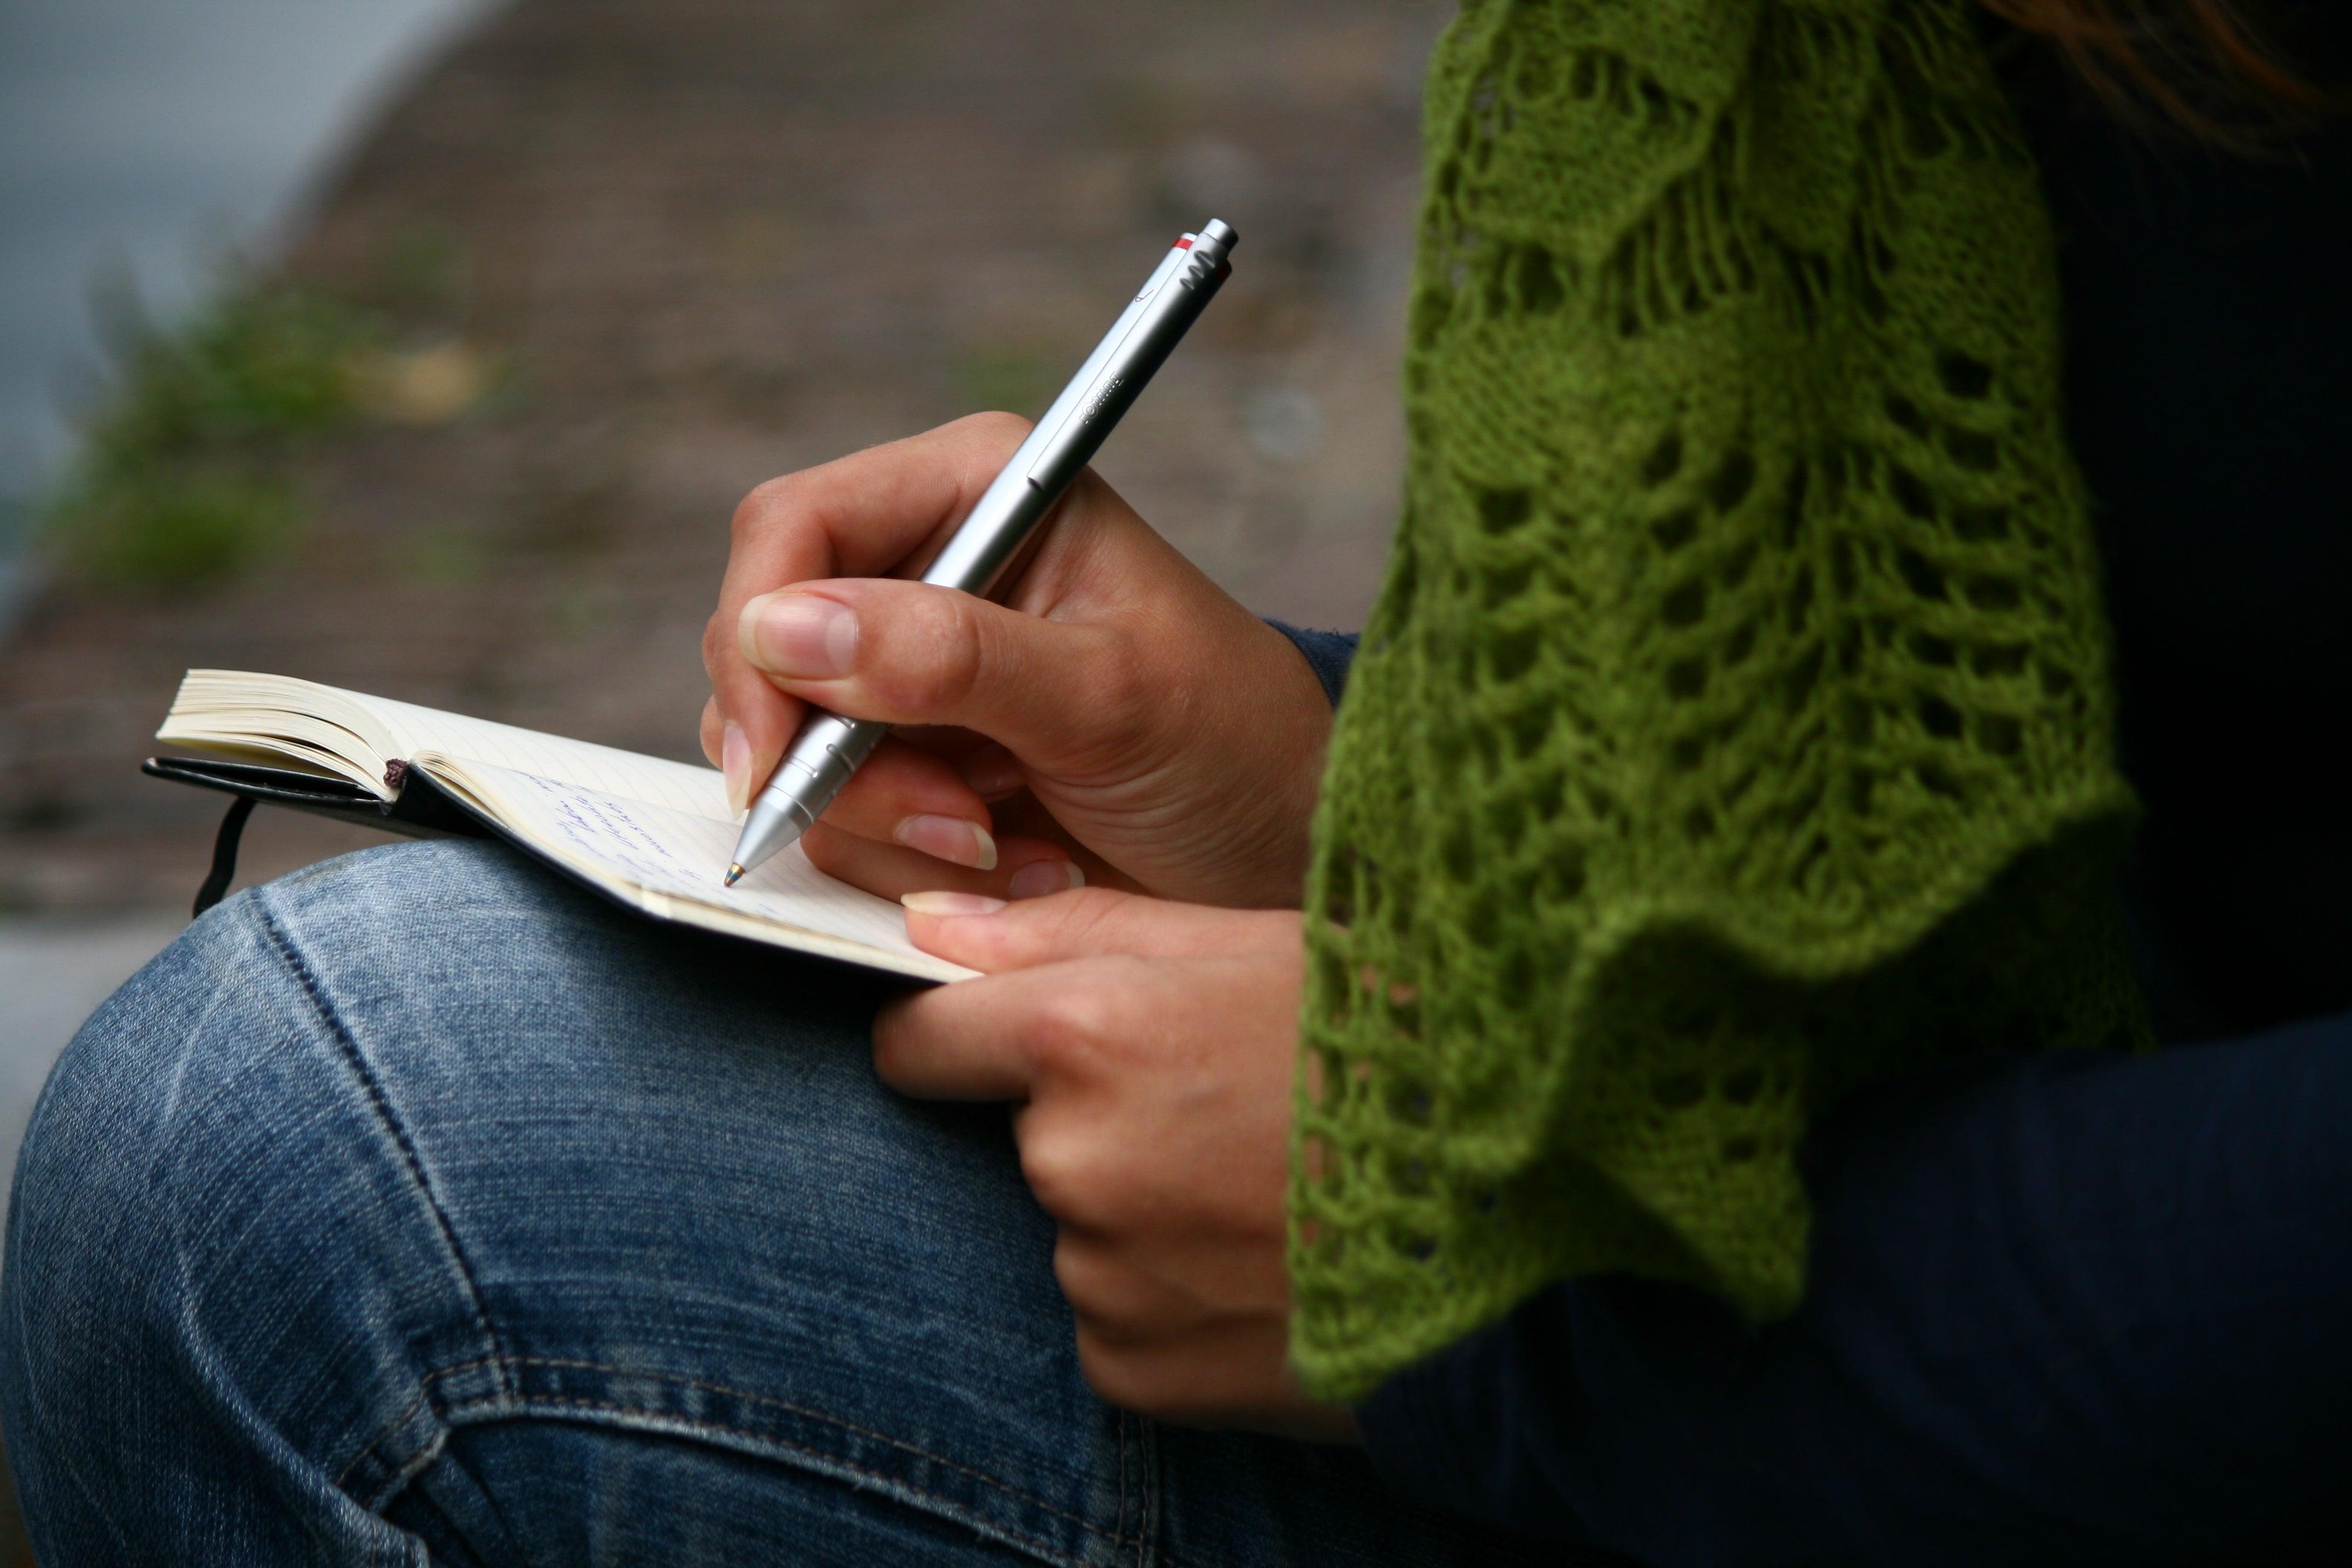 Escribir contribuye a un desahogo emocional